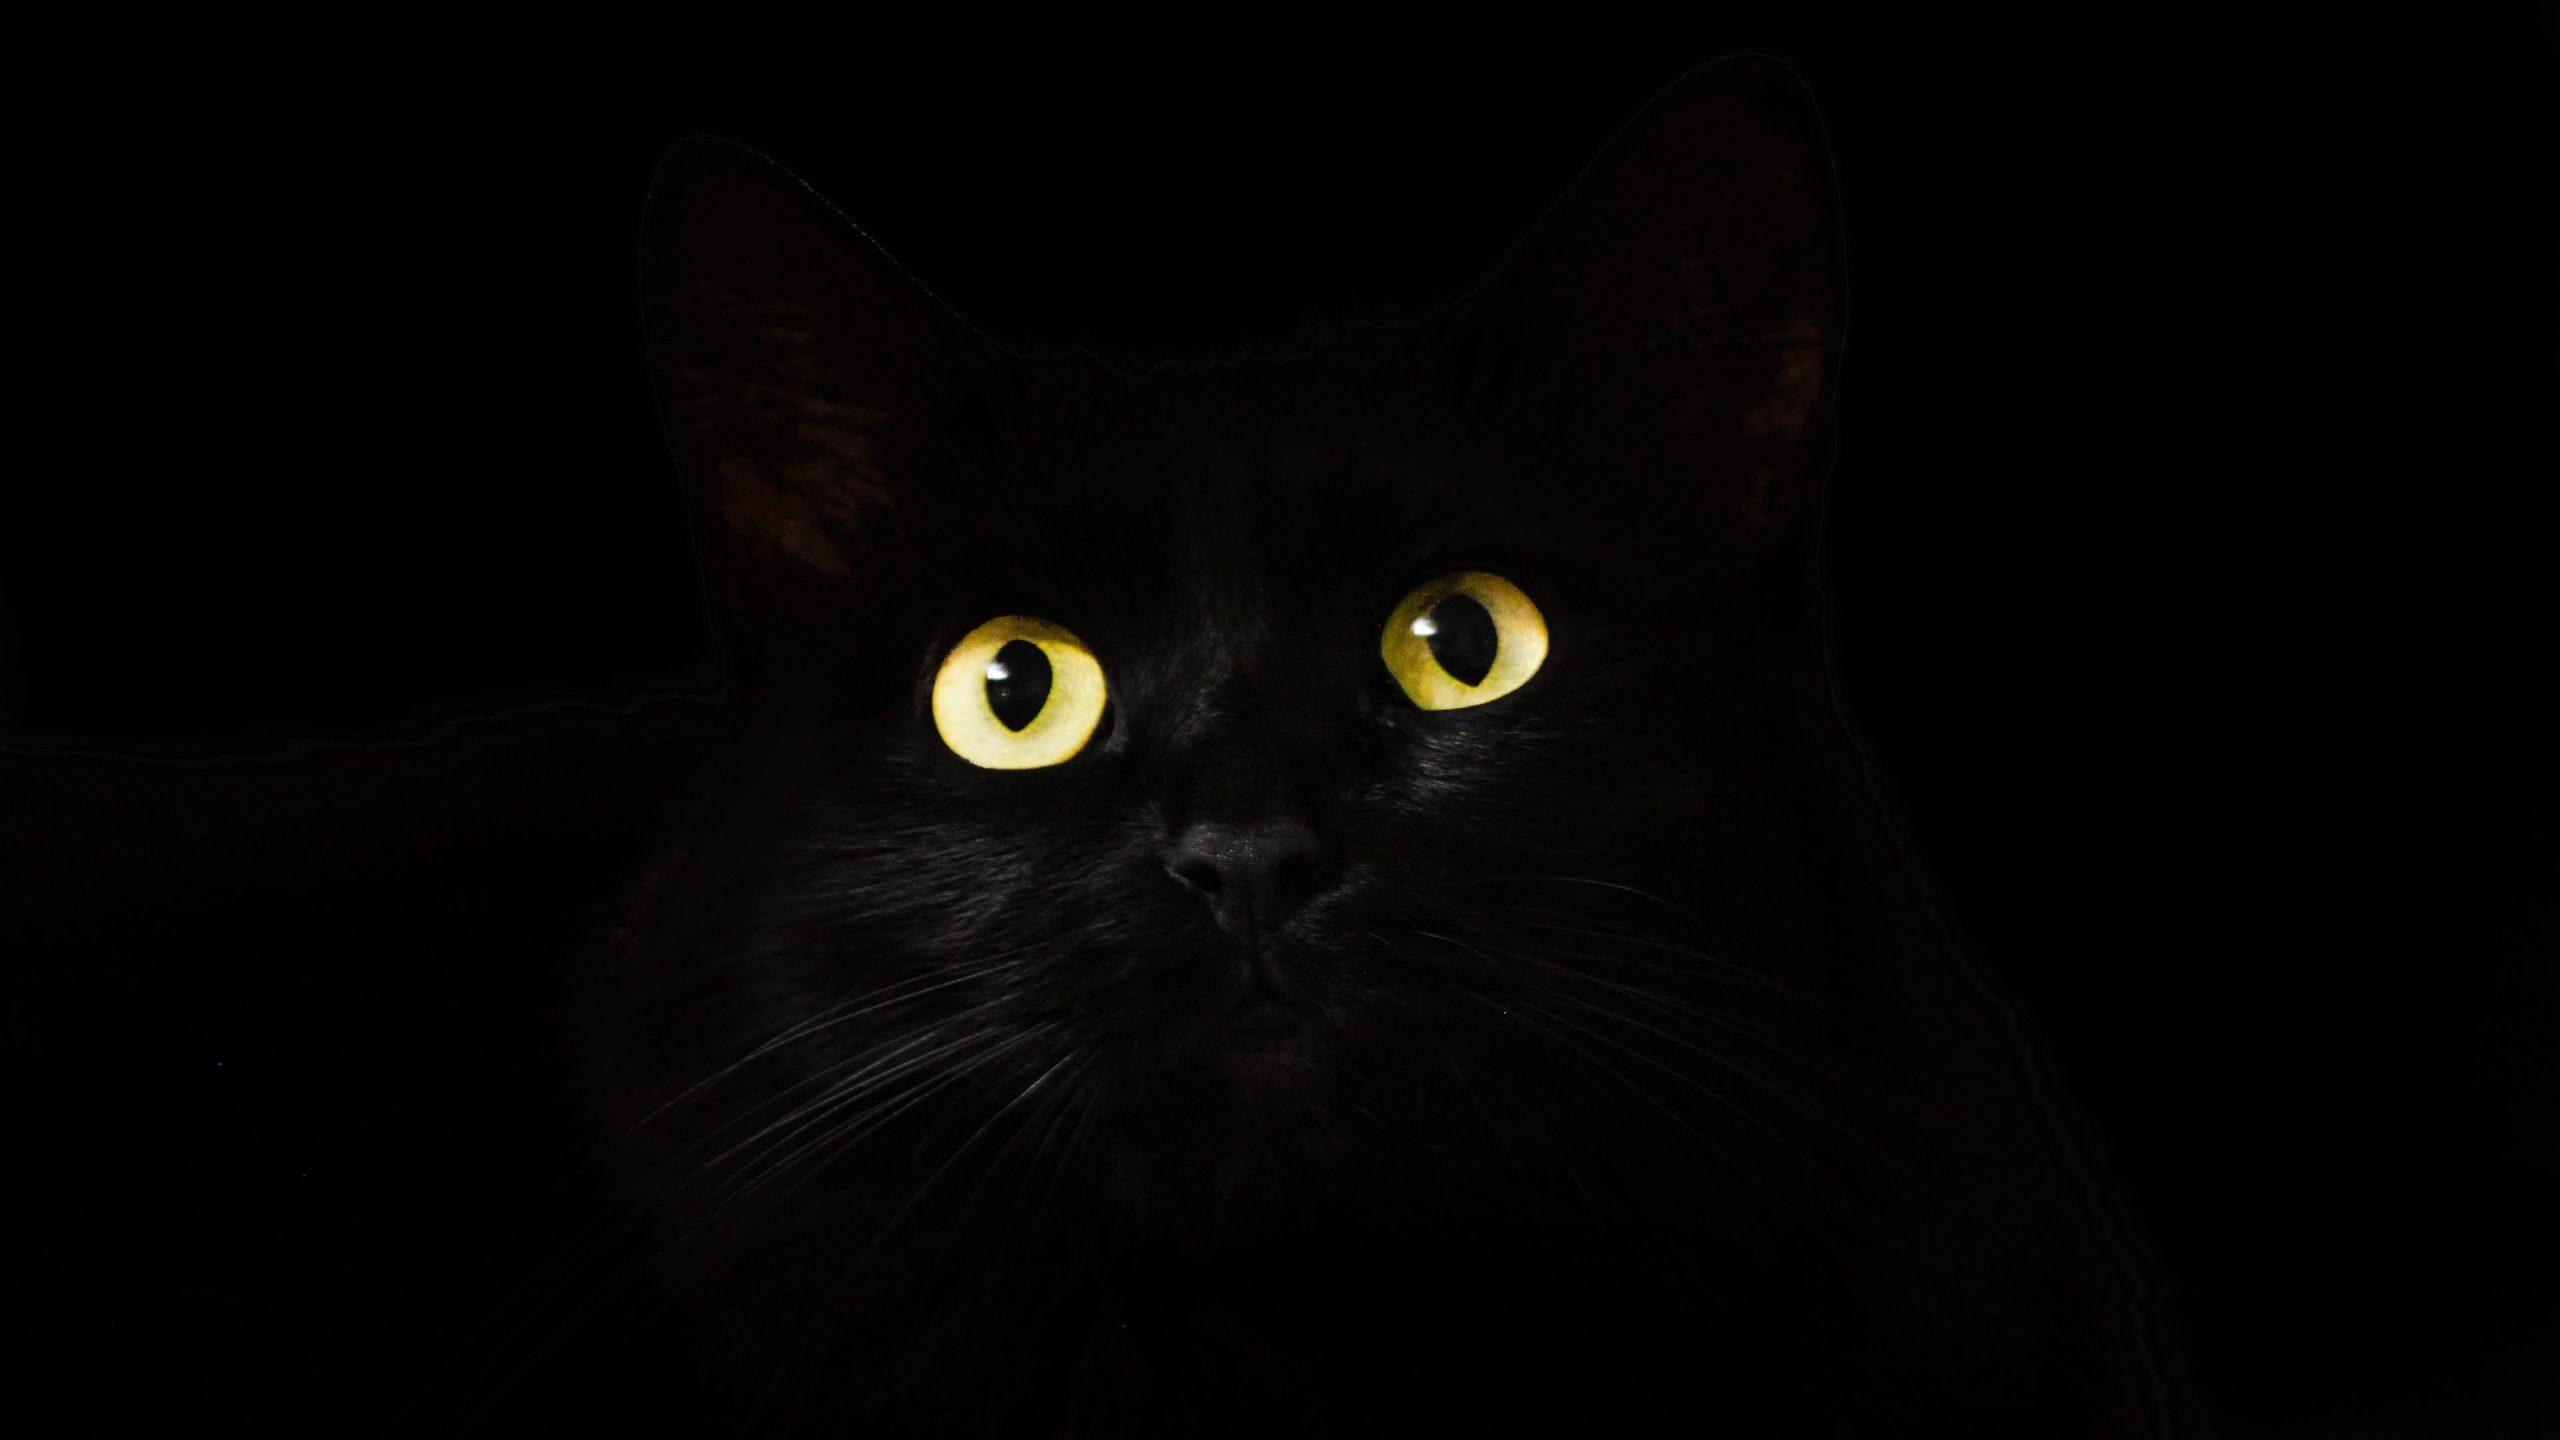 Cat Eyes Desktop 4K Wallpaper